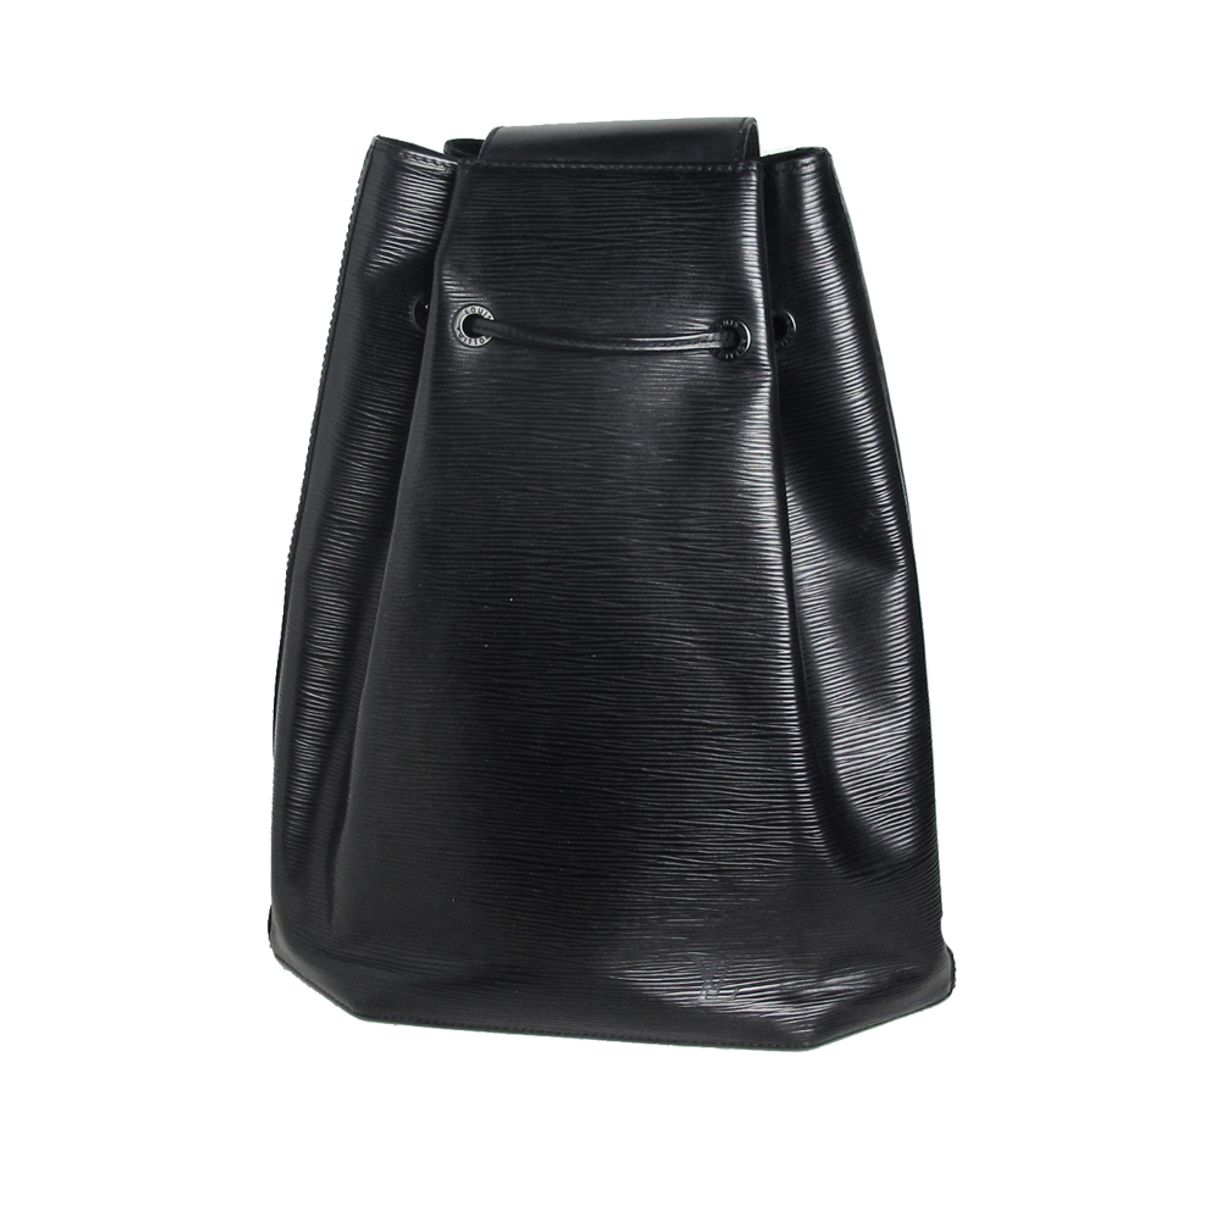 Mochila-Louis-Vuitton-Epi-Leather-One-Strap-Backpack